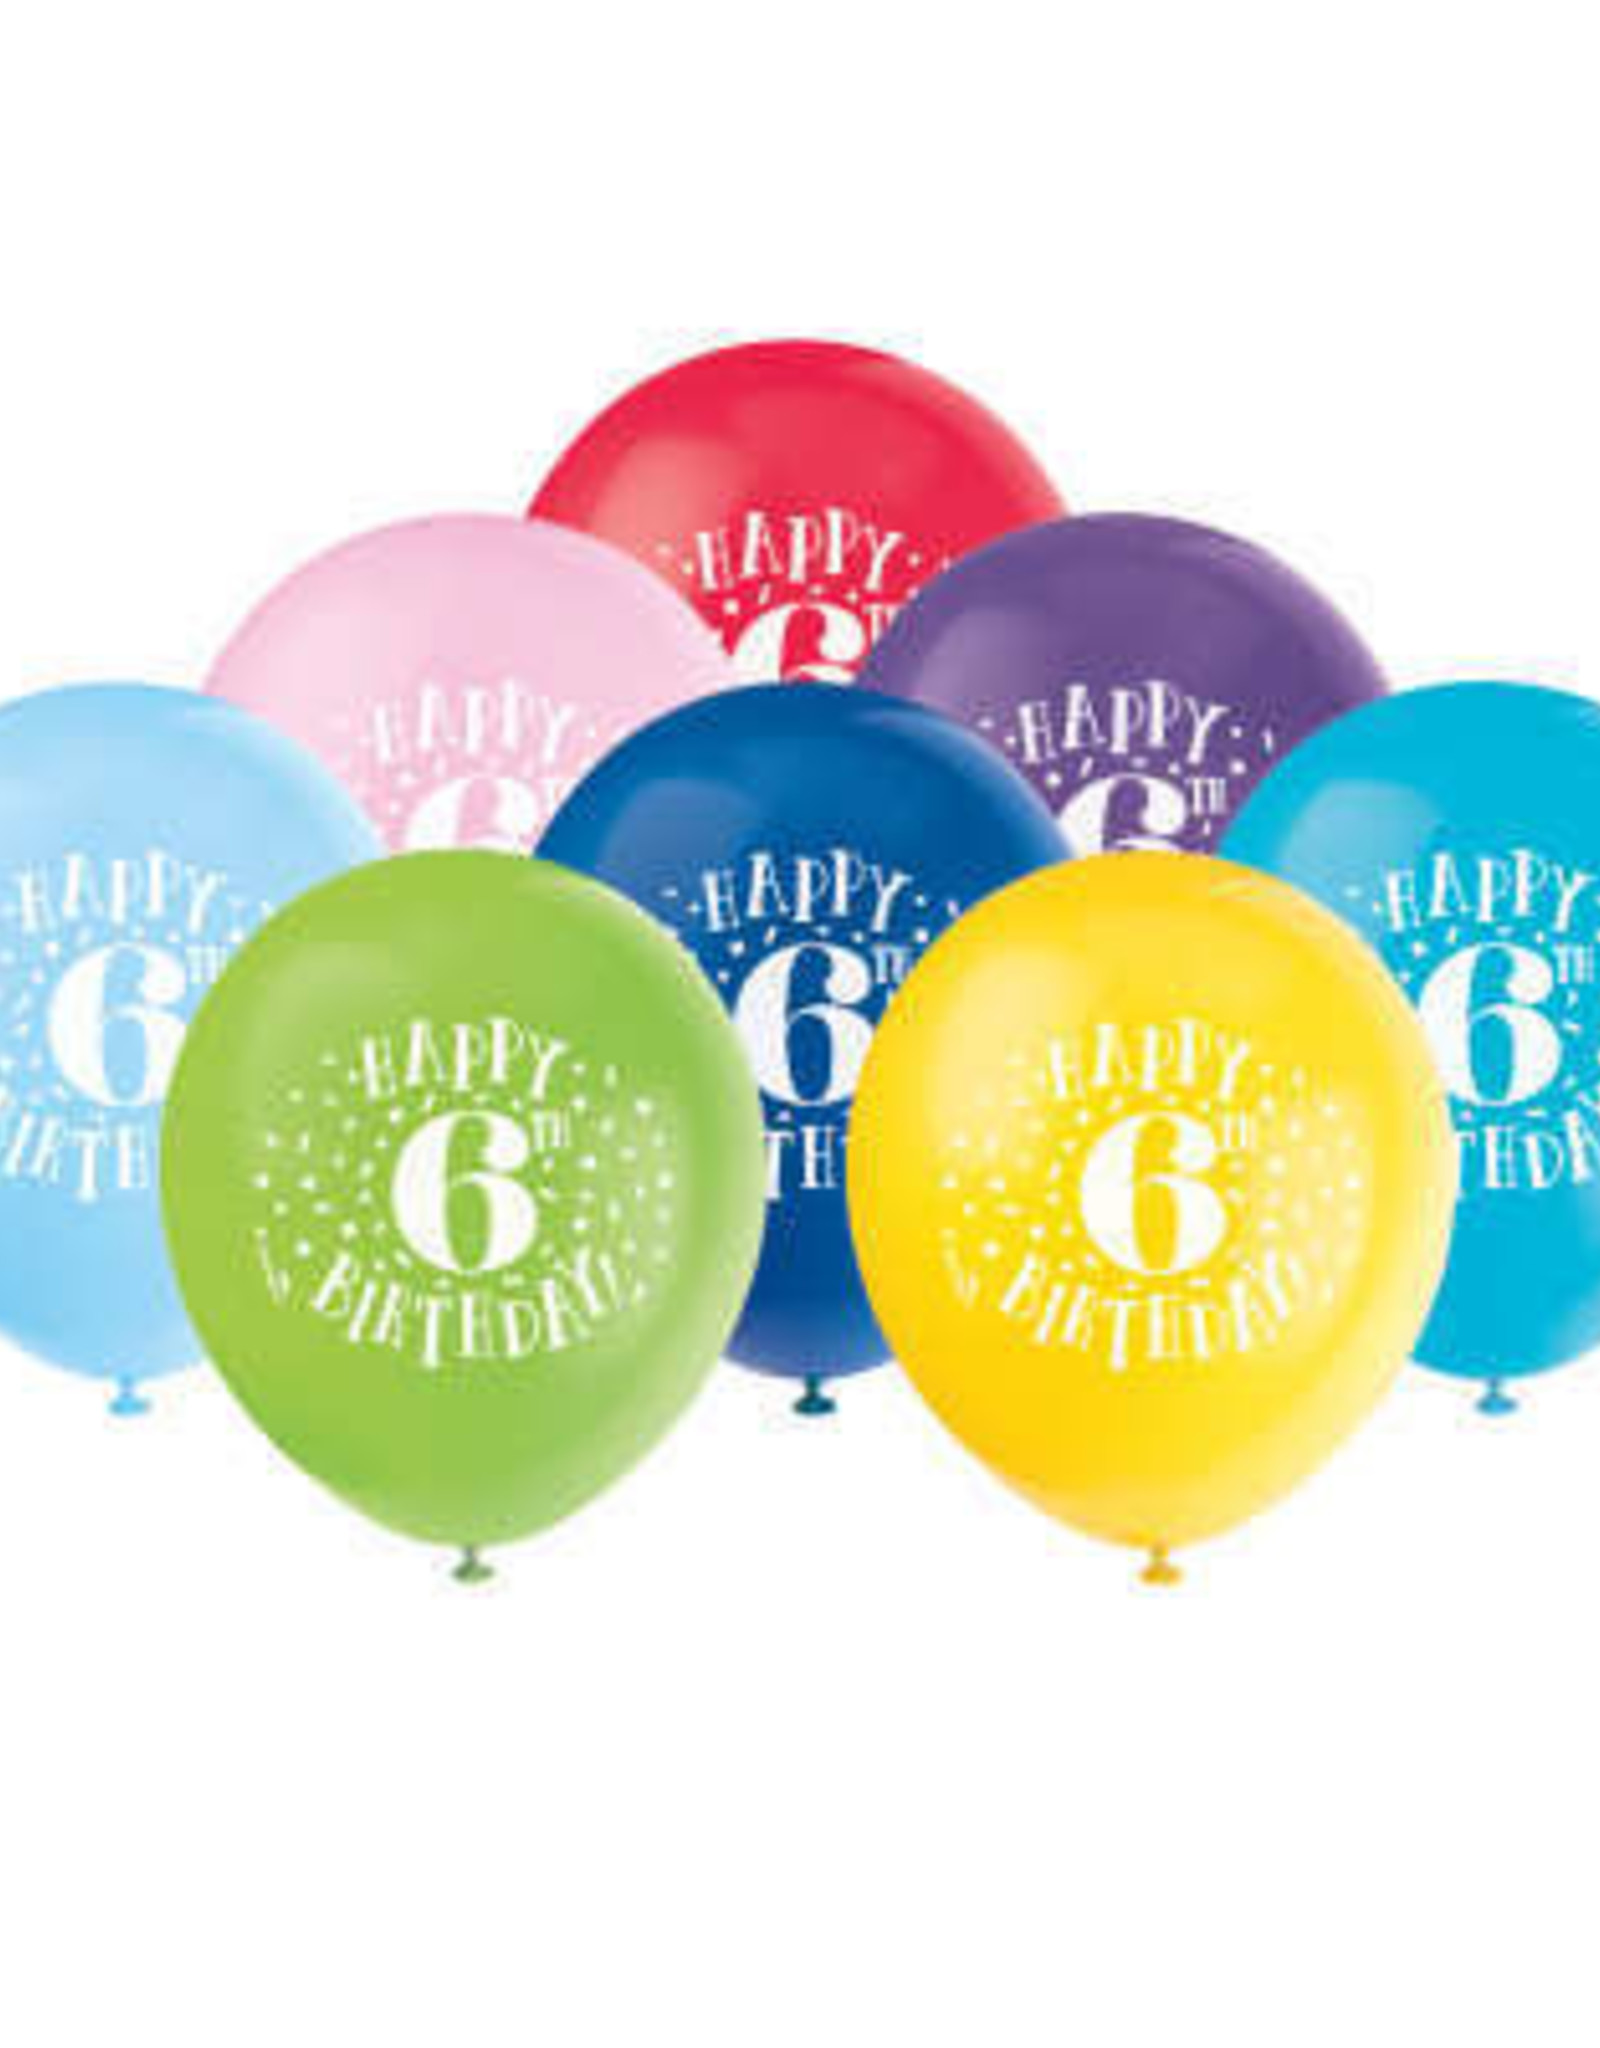 "'Happy 6th Birthday' 12"" Latex Balloons 8ct"